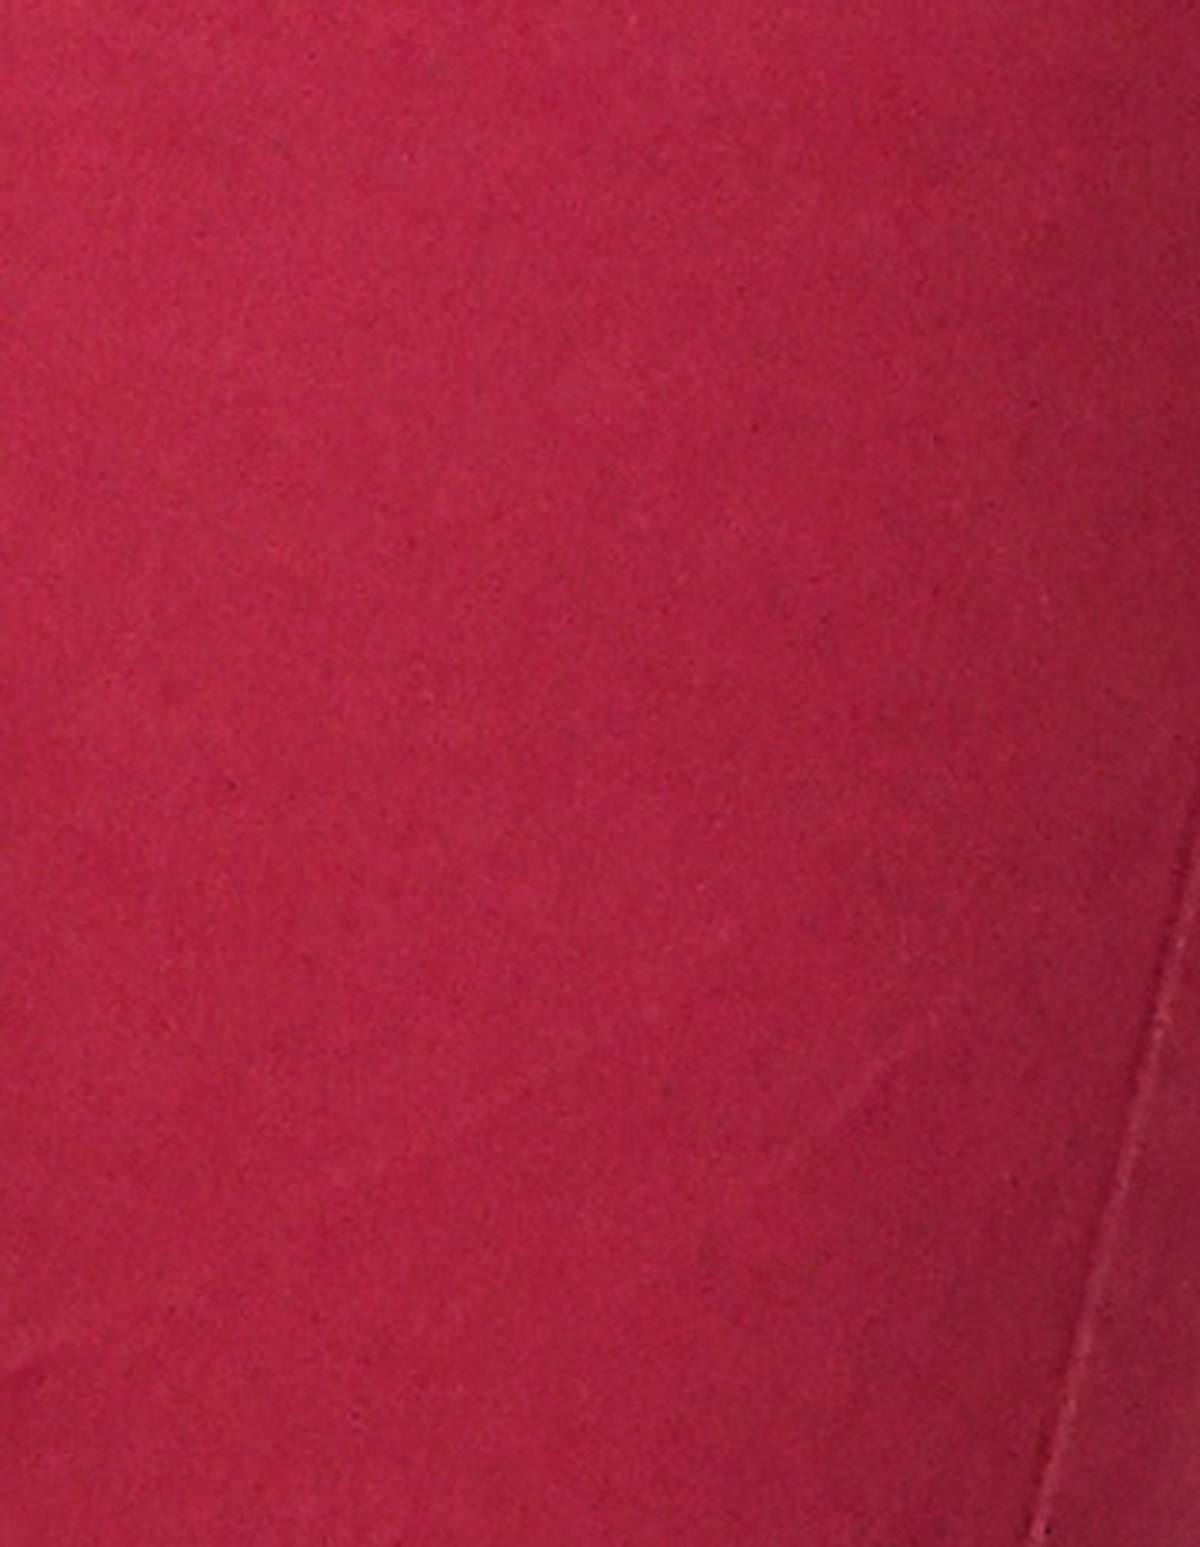 pantaloni dama rosu 6057